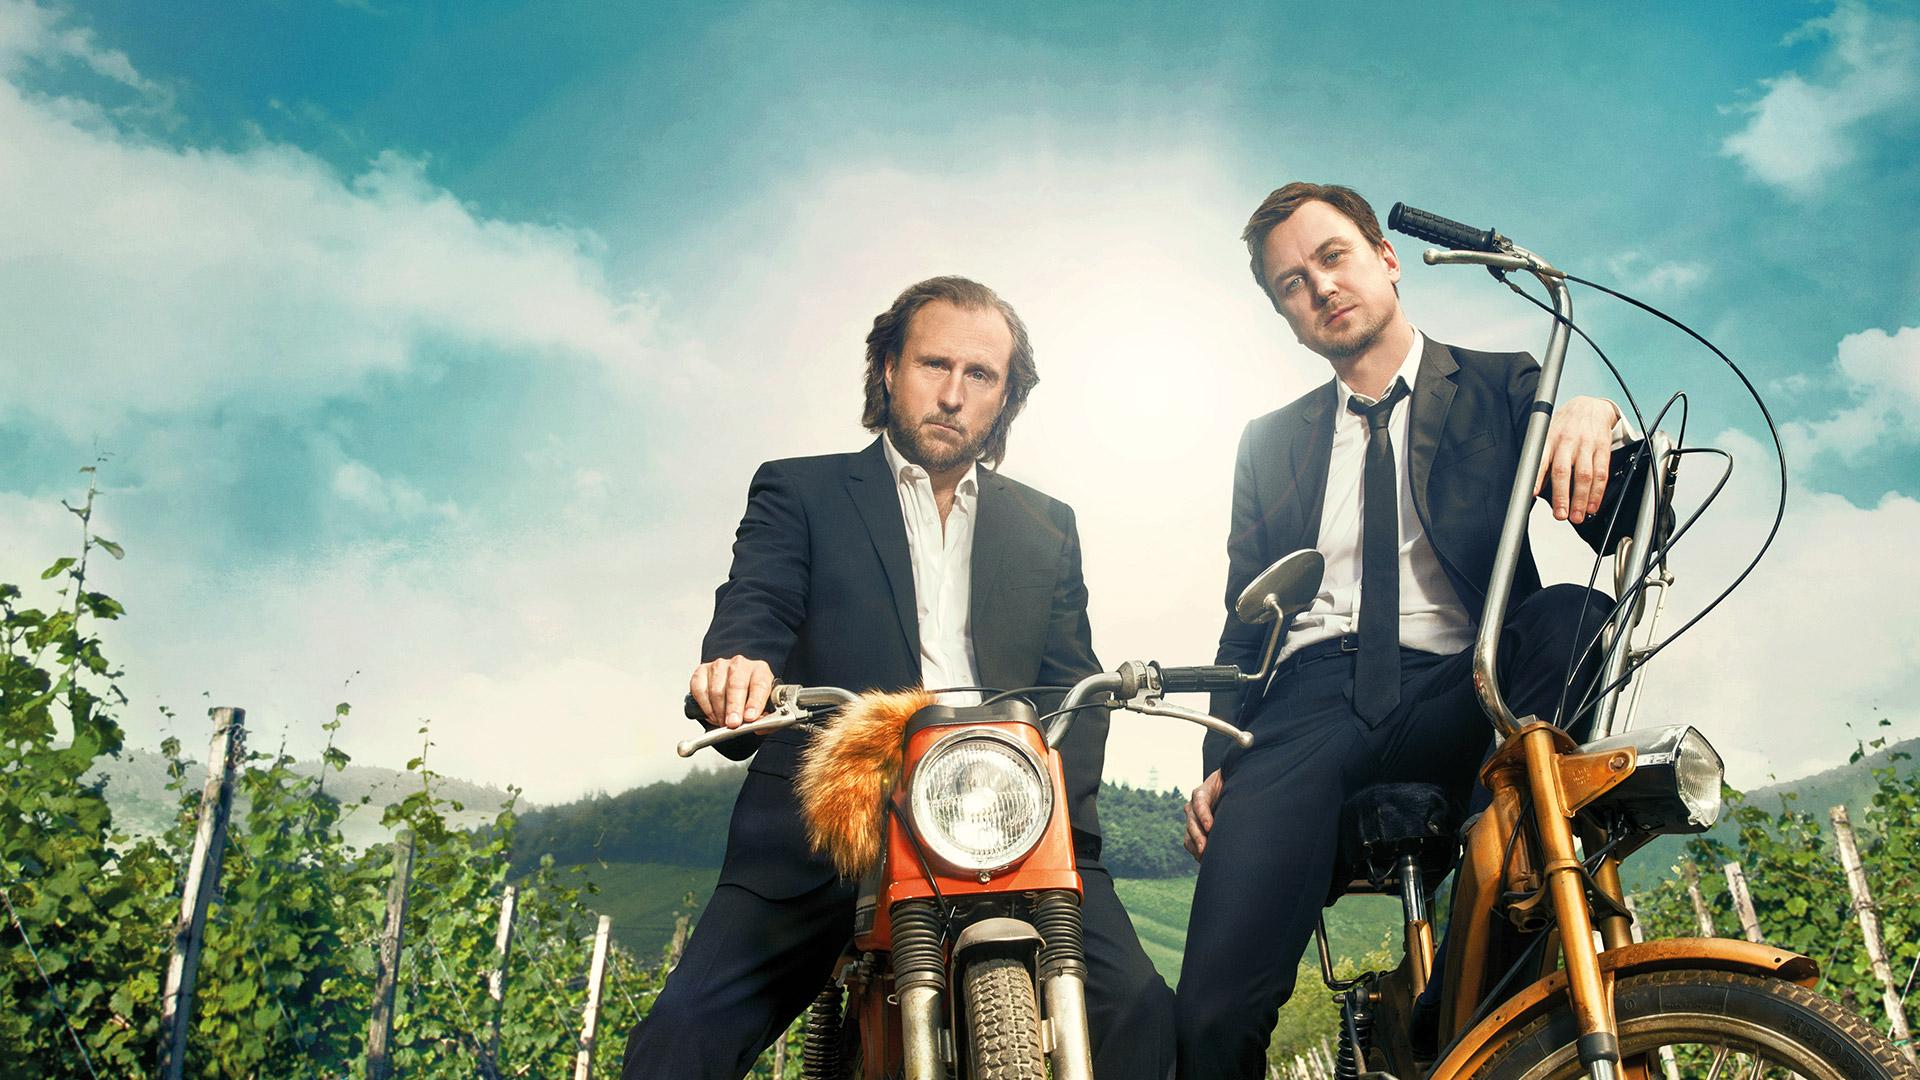 25 km/h. Winner of Audience Polling Hits Cinemas in January